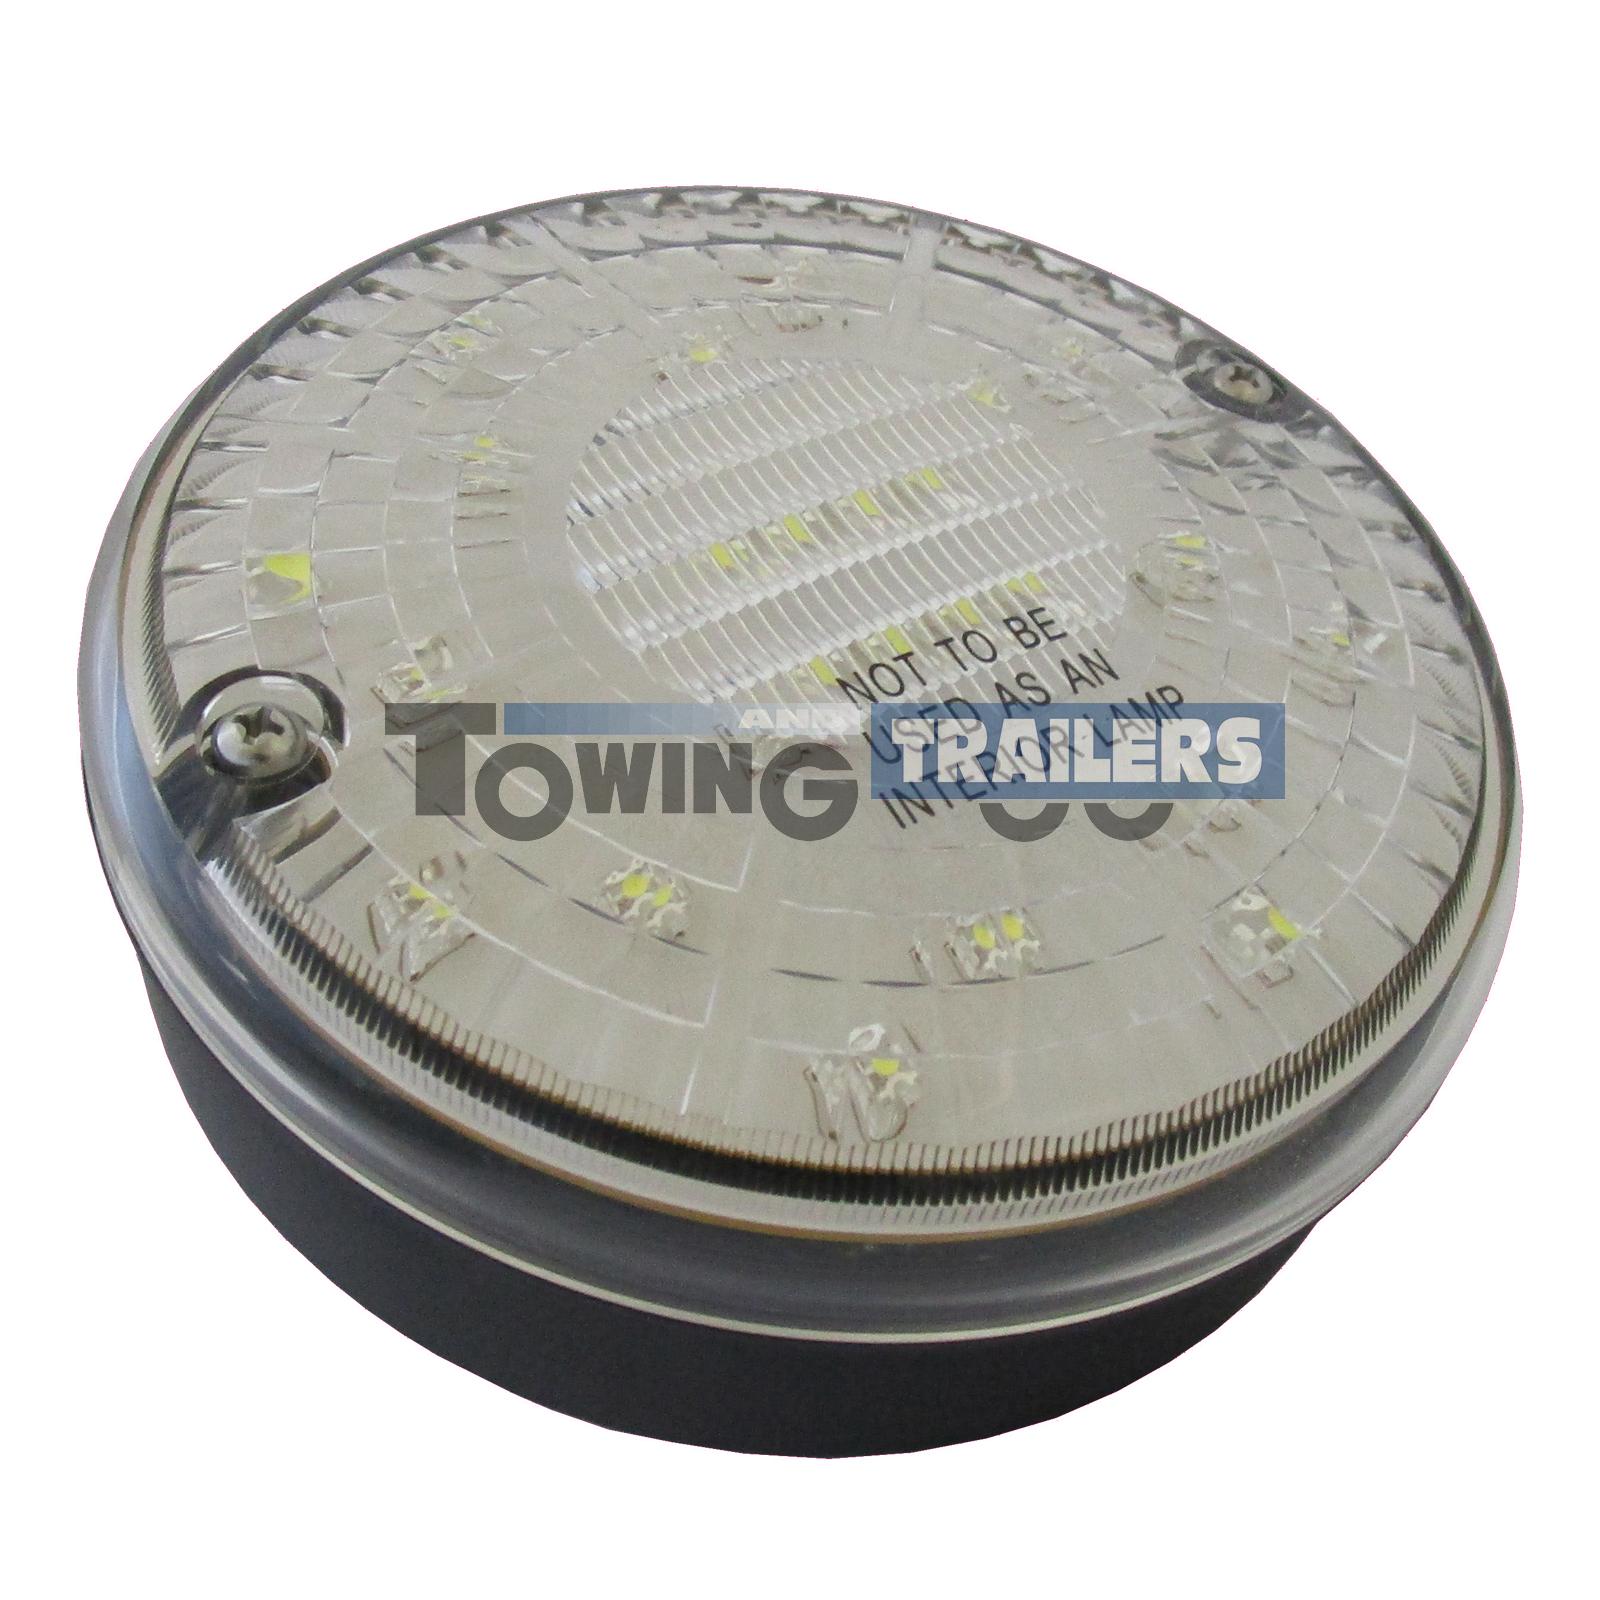 LED Autolamps 140WM Multivolt Round Reverse Light for Trailers